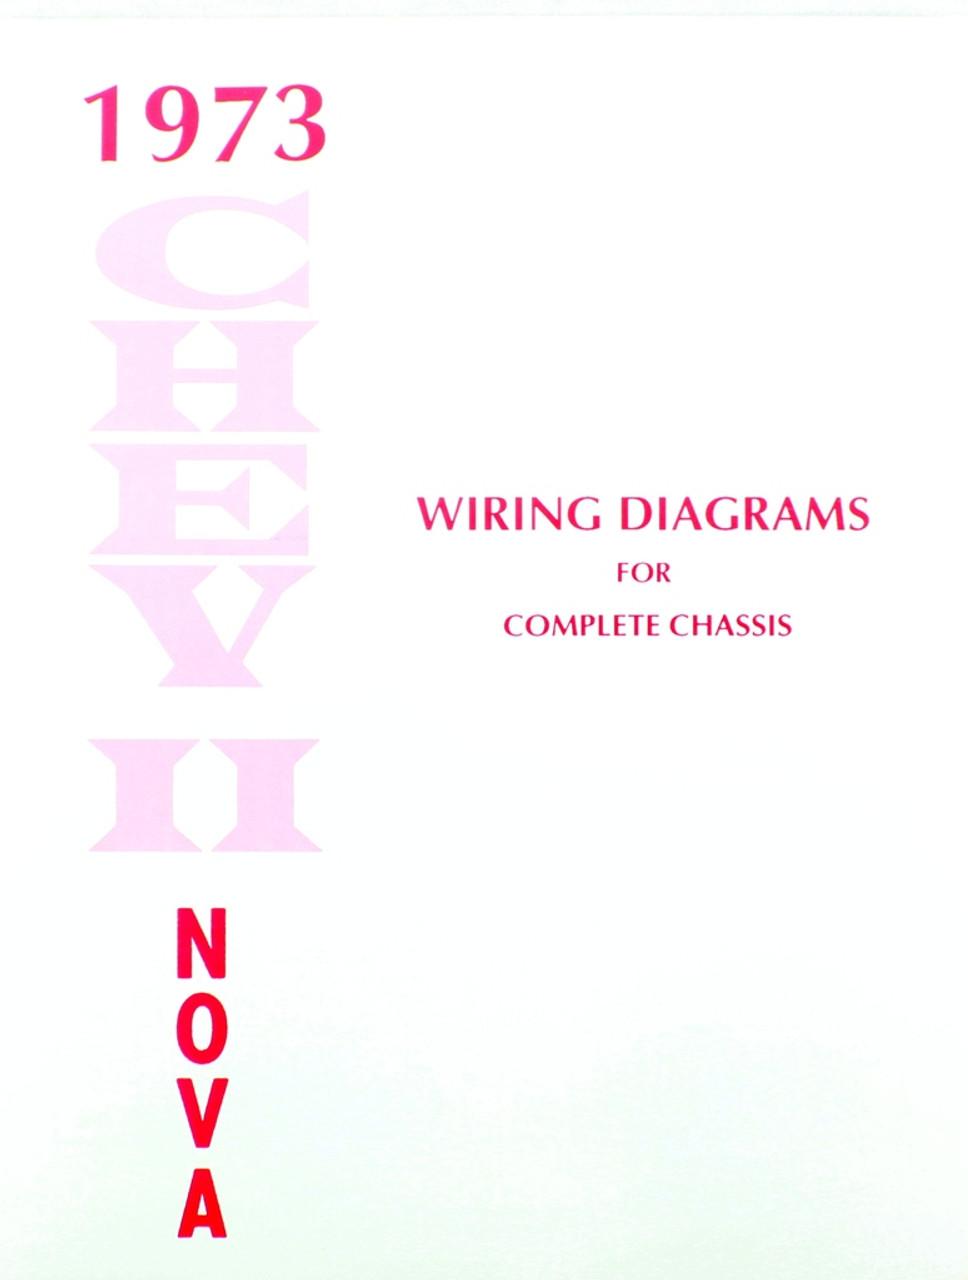 73 nova wiring diagram explore wiring diagram on the net nova wiring schematic on 1973  [ 968 x 1280 Pixel ]